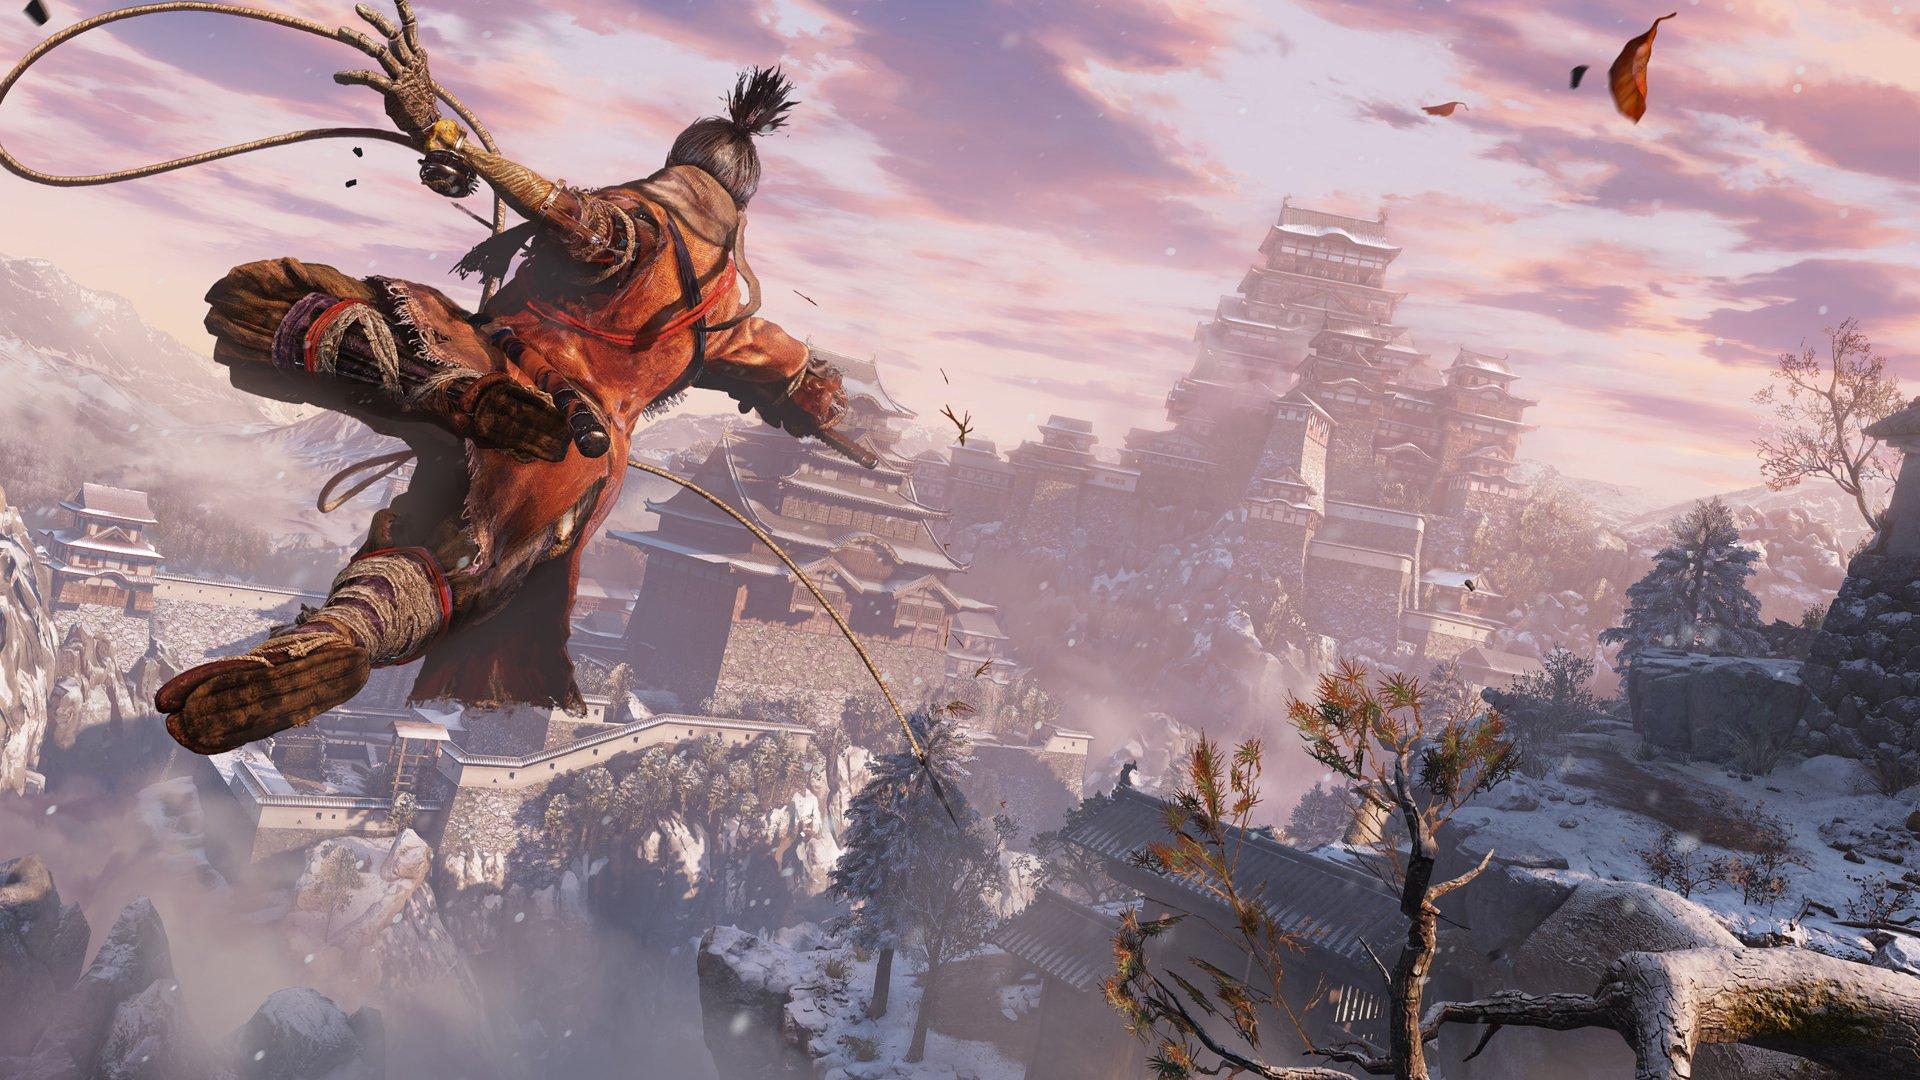 Amazon.com: Sekiro Shadows Die Twice - PlayStation 4 ...